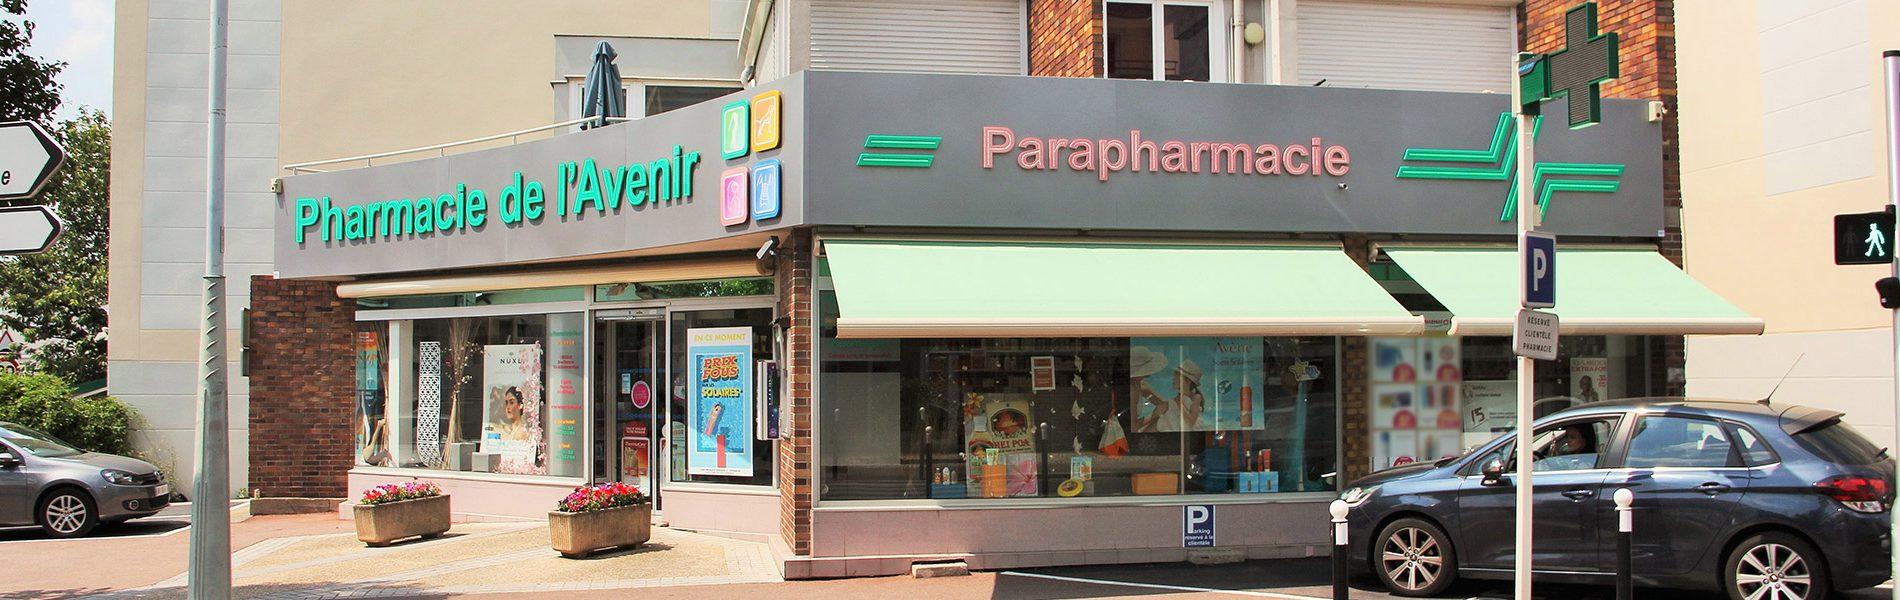 Pharmacie DE L'AVENIR - Image Homepage 1